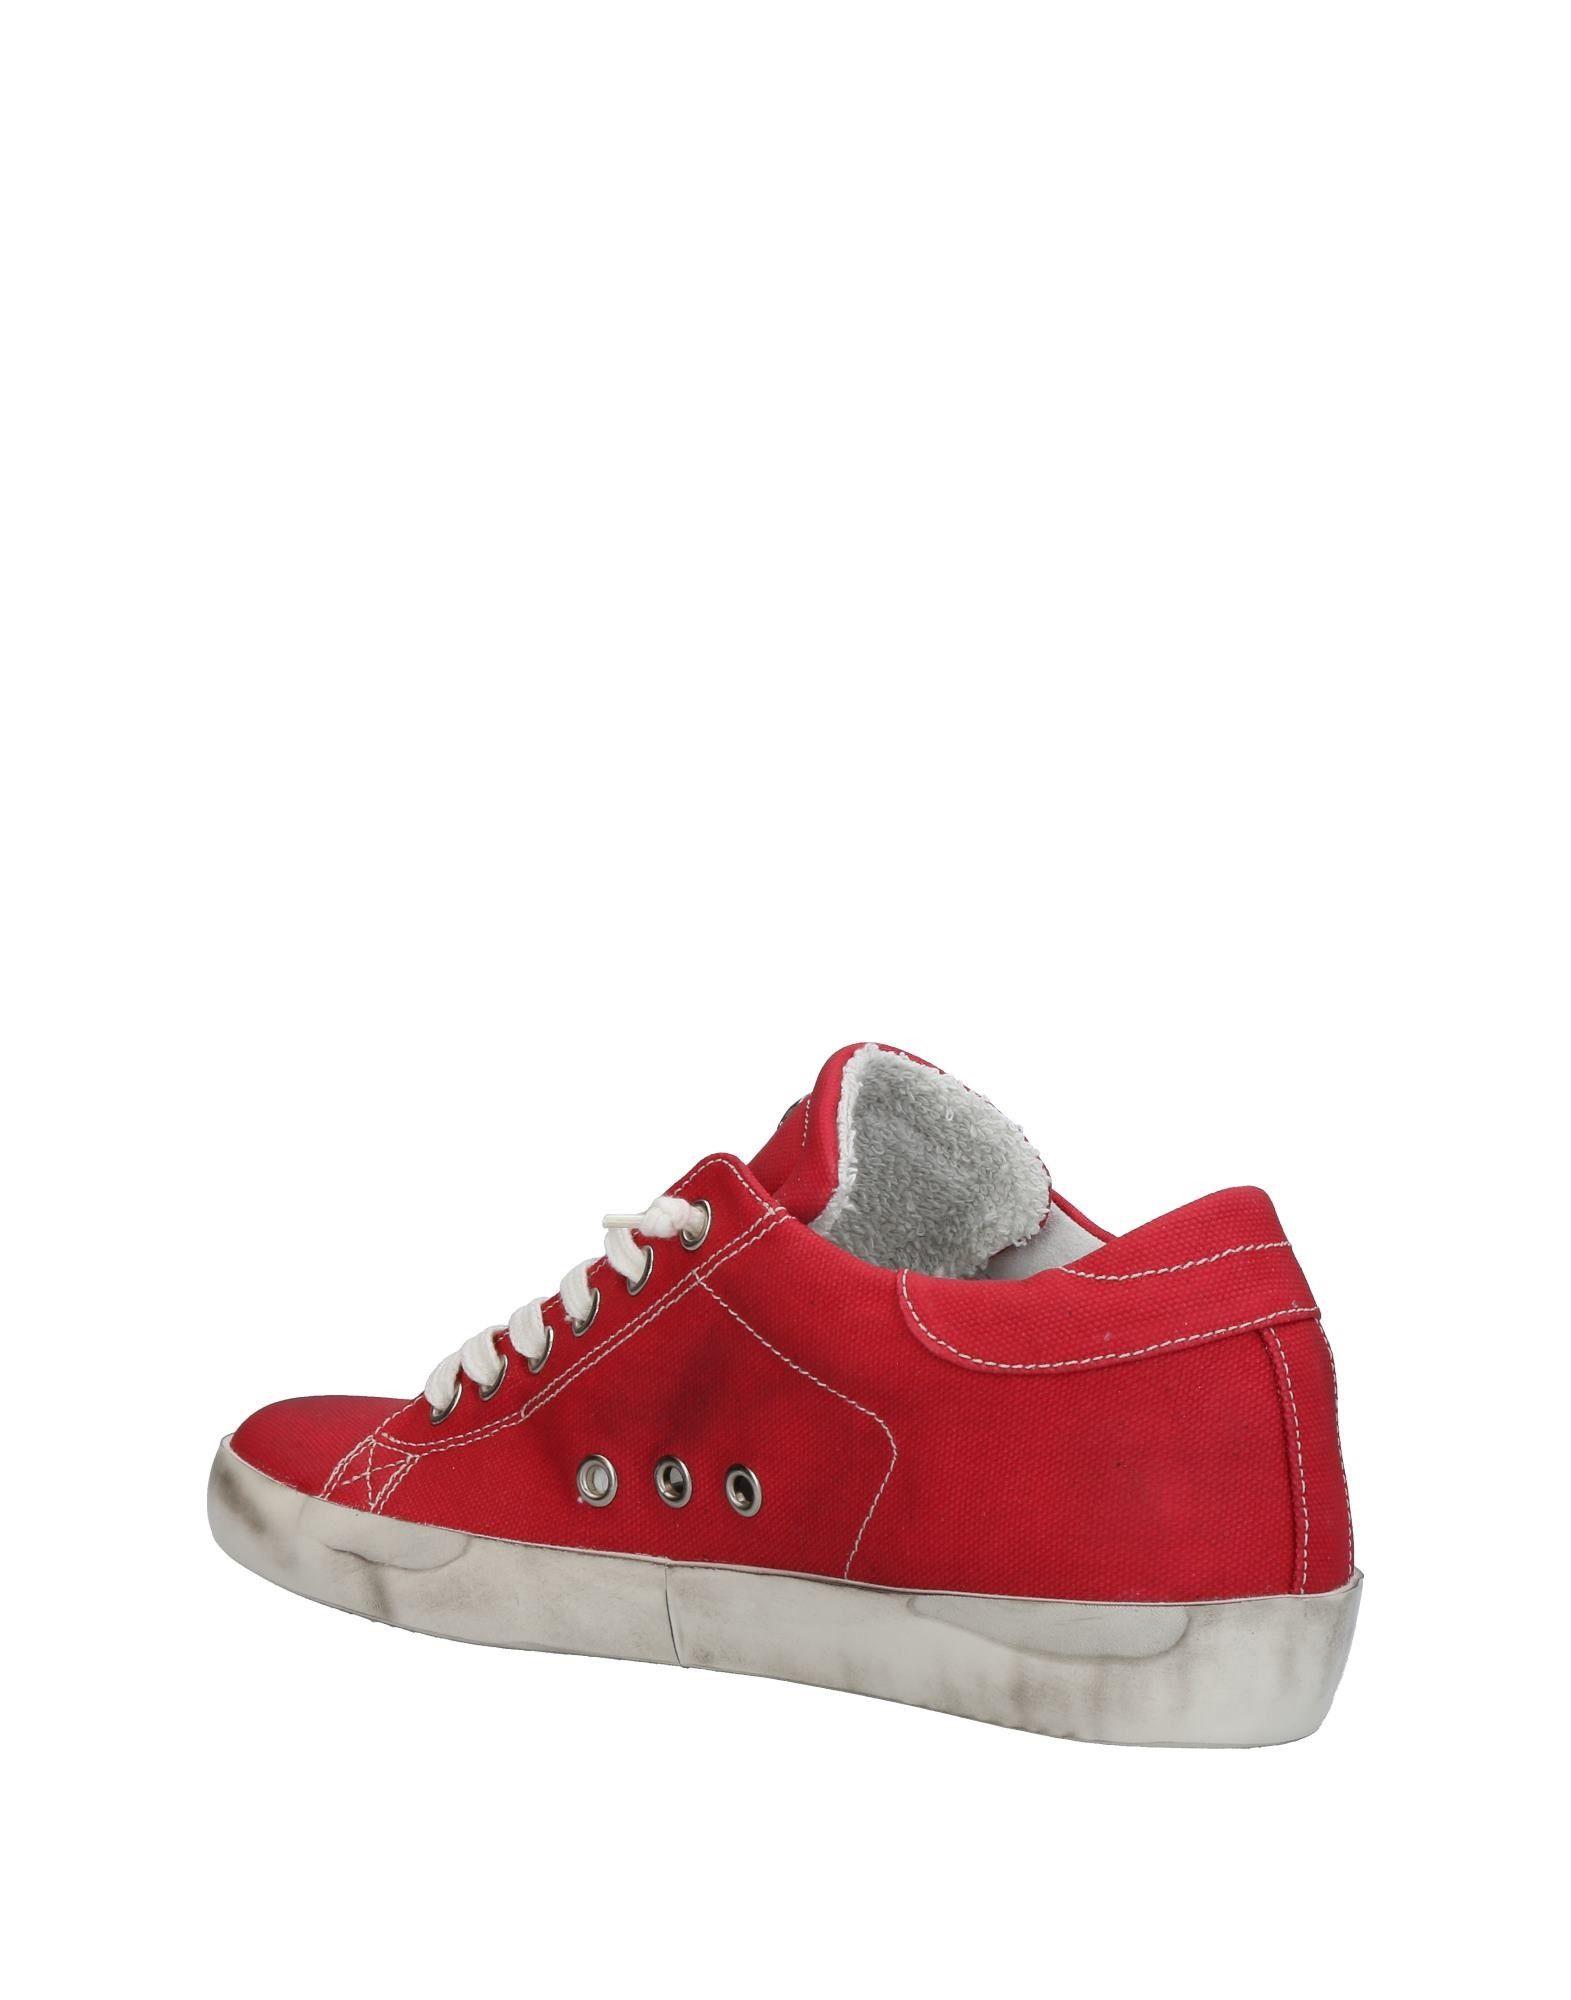 Leather Crown Sneakers Damen Damen Sneakers  11175103AE Neue Schuhe 77e755